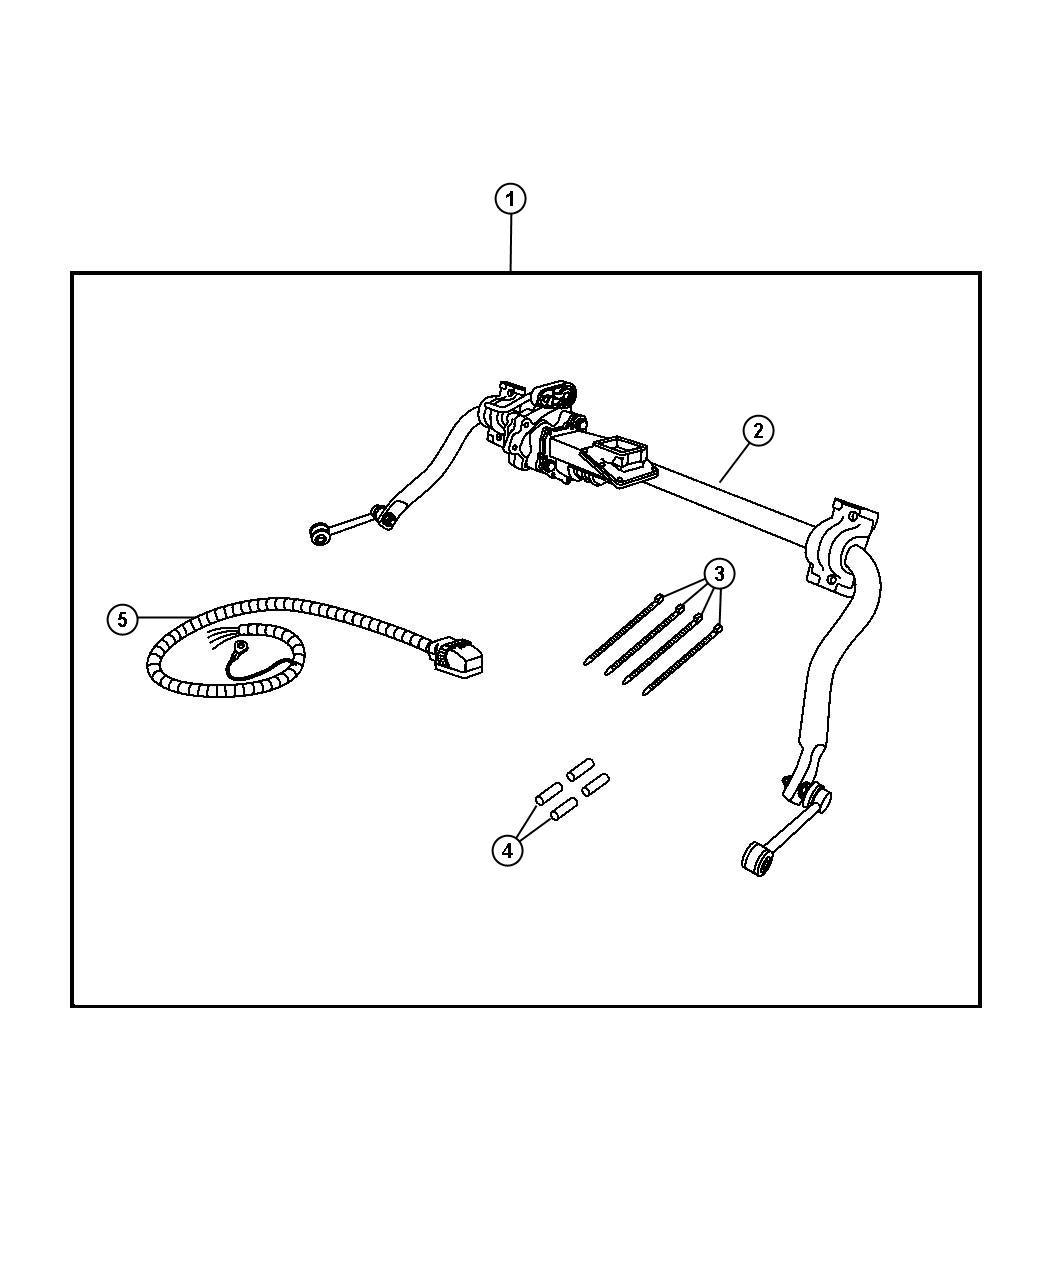 Jeep Wrangler Harness Trailer Bar Electronic Kit